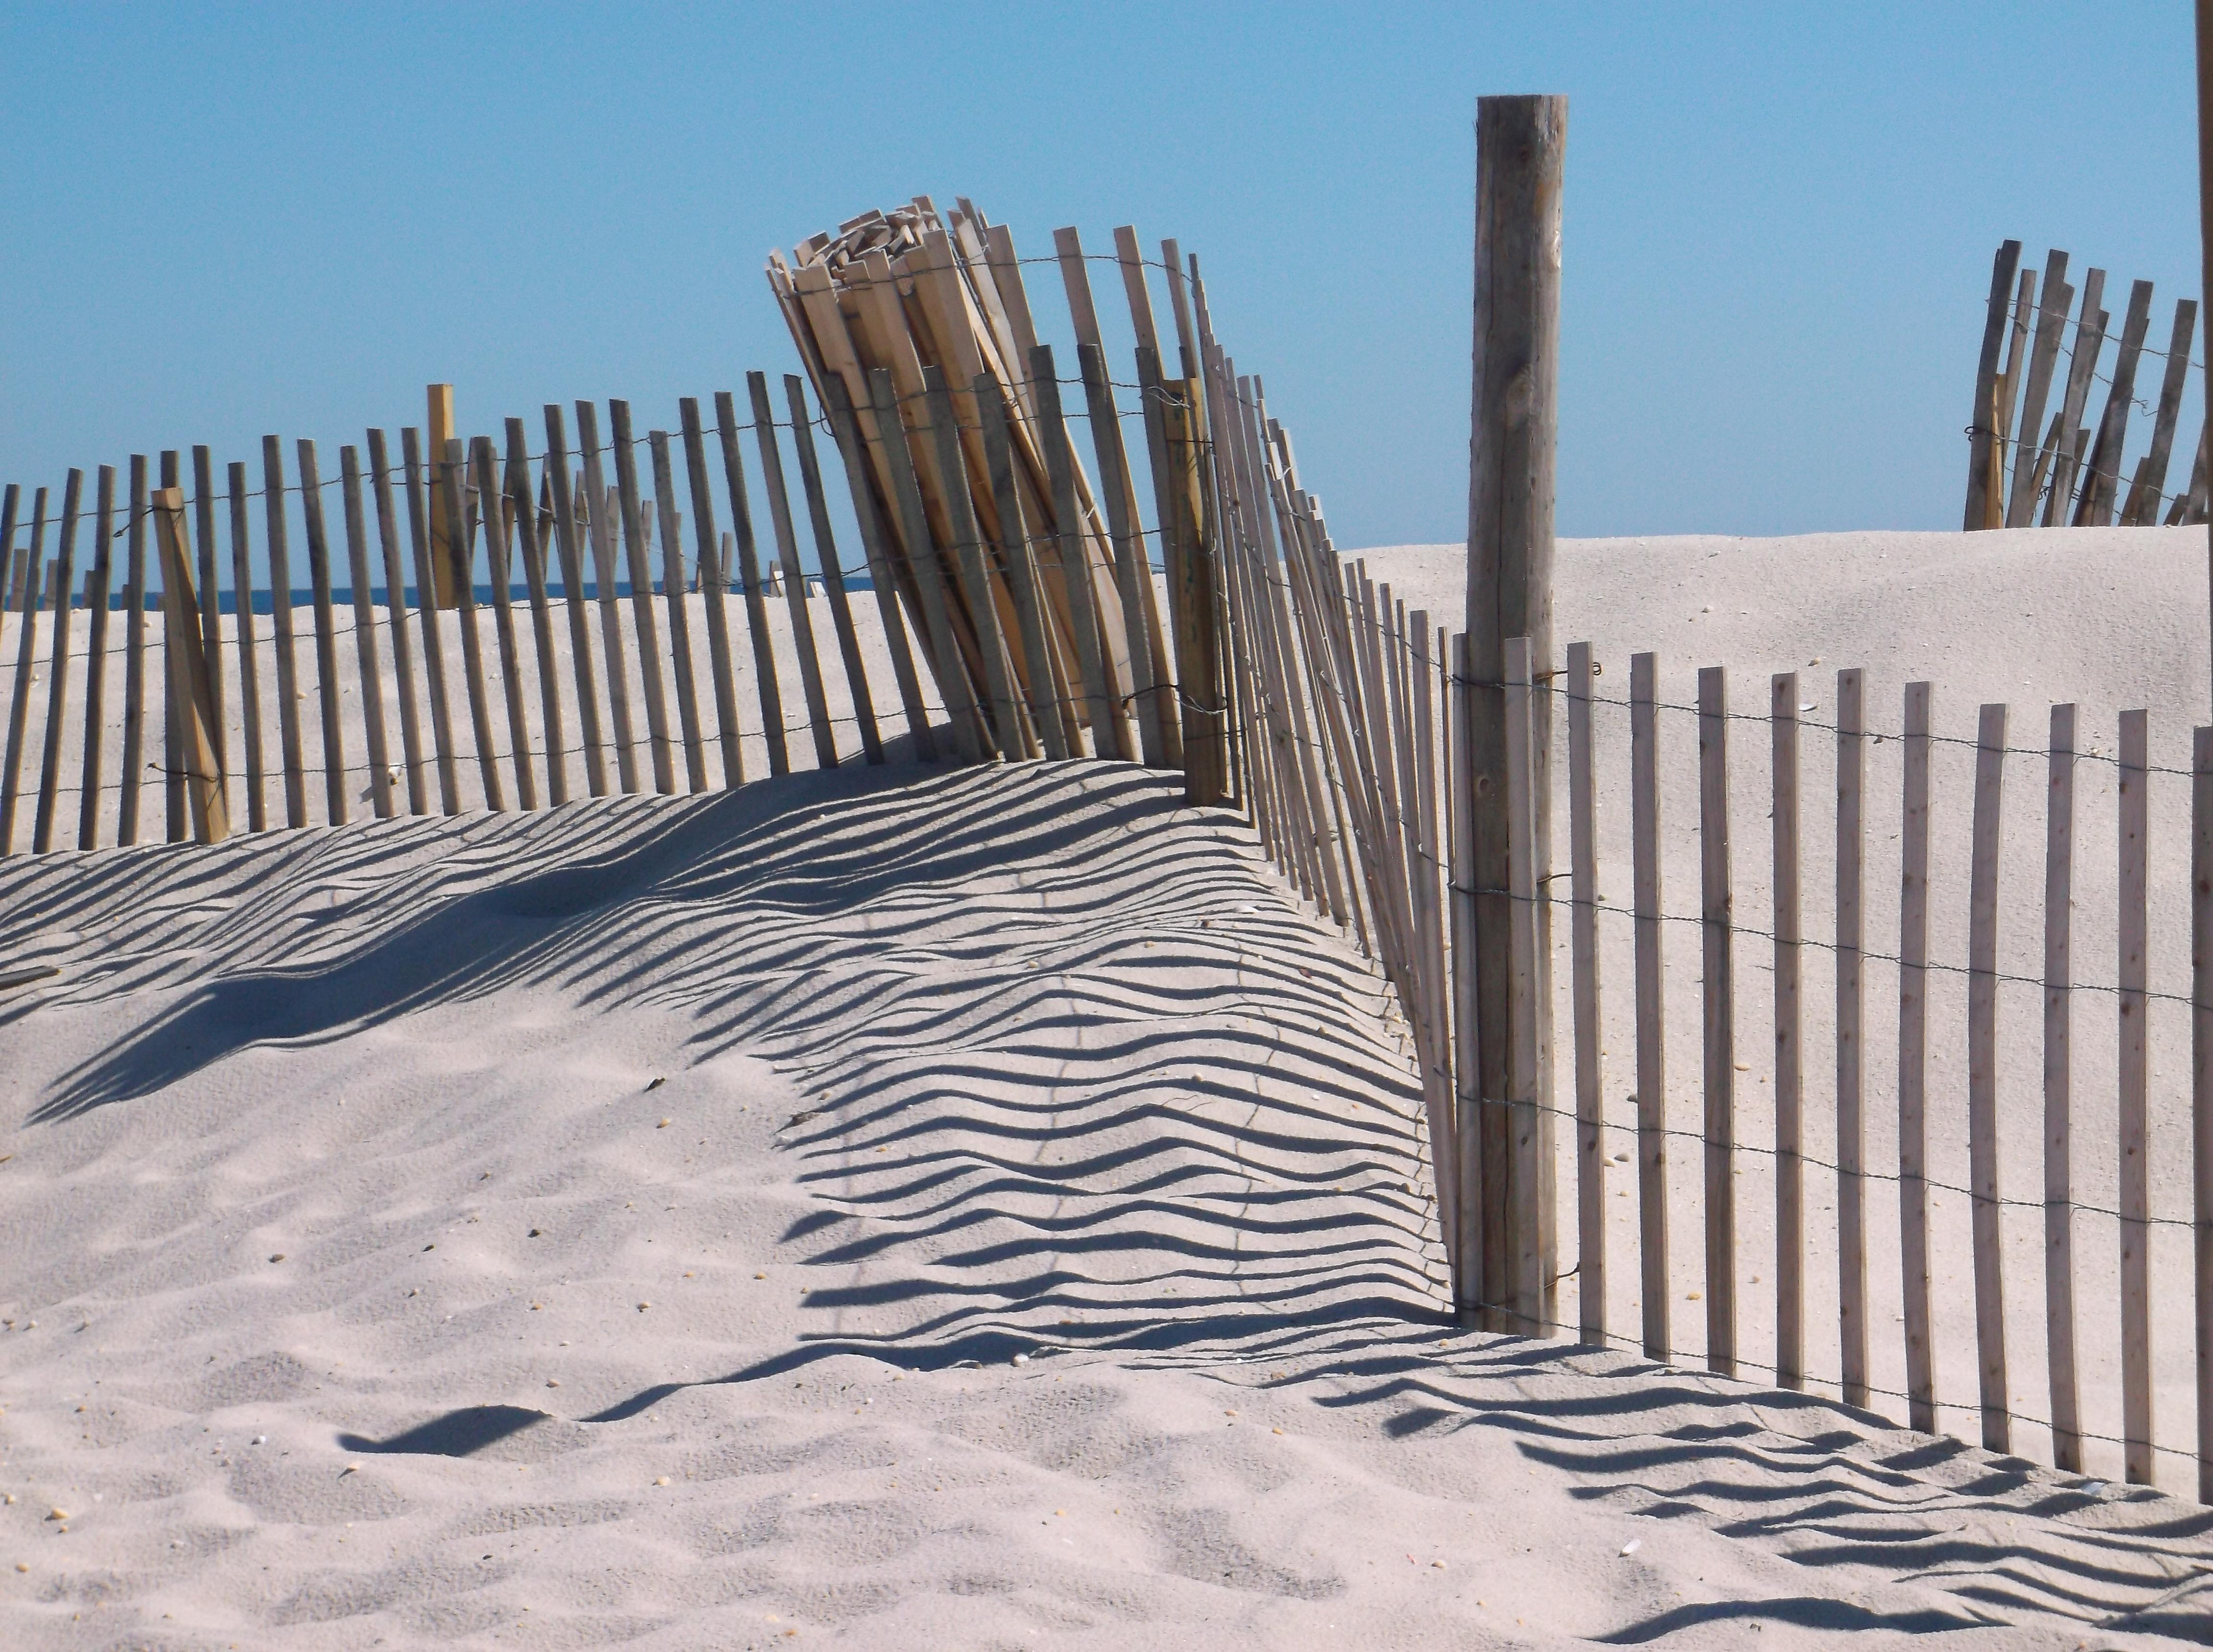 Seaside Dunes - Linda OsieckiDSCF0559